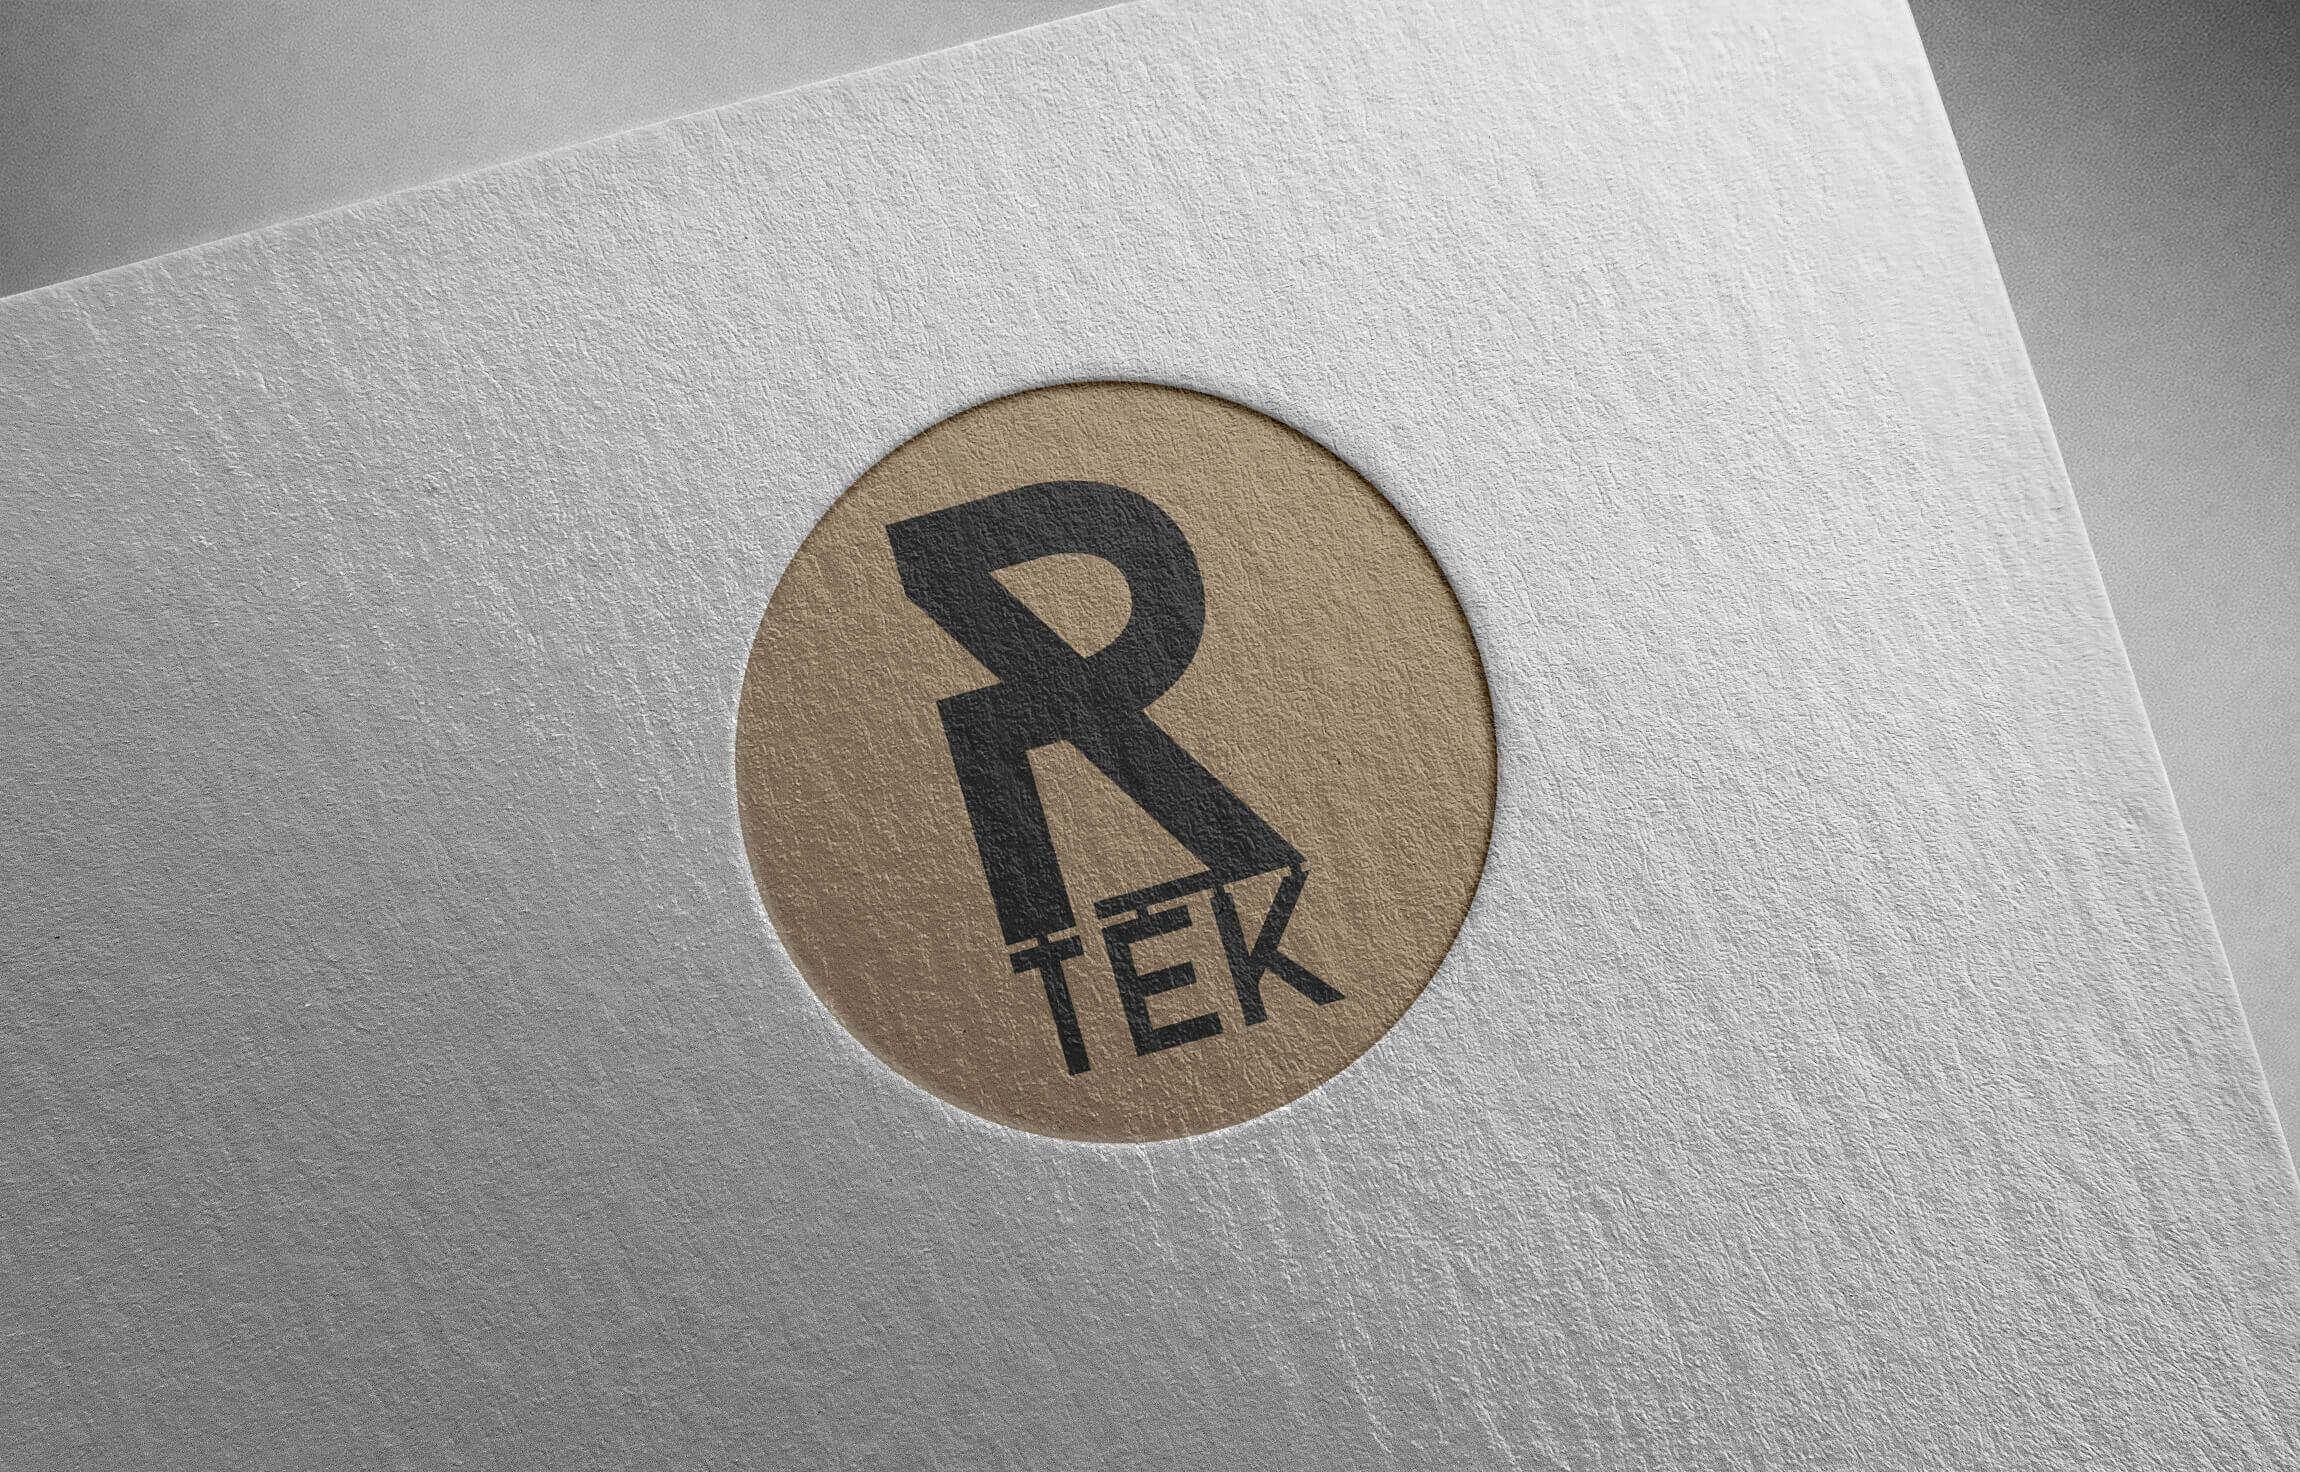 rteck_logo